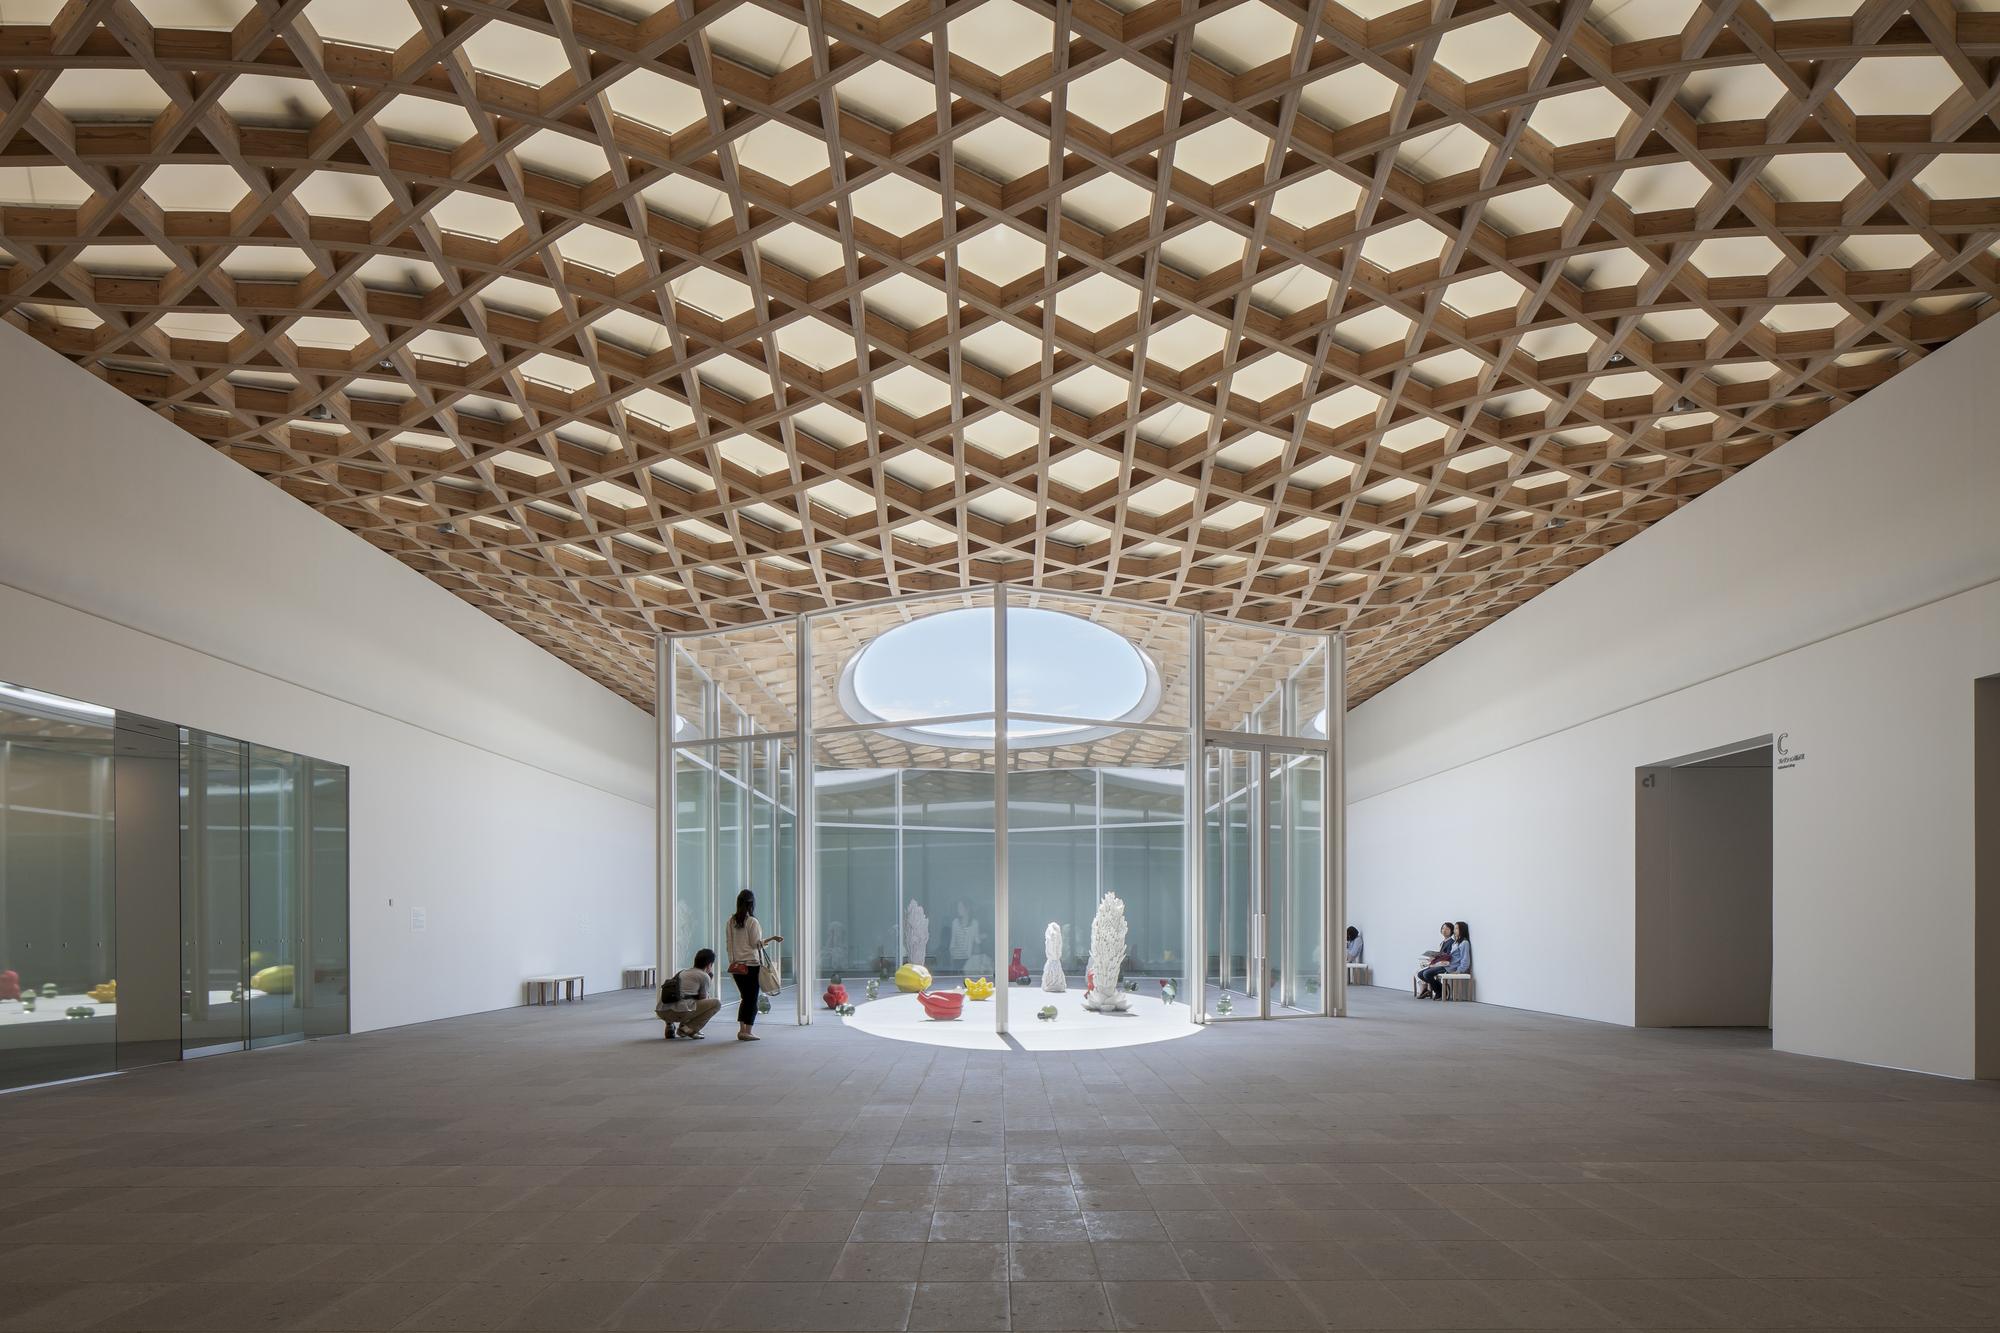 oita prefectural art museum shigeru ban architects archdaily. Black Bedroom Furniture Sets. Home Design Ideas